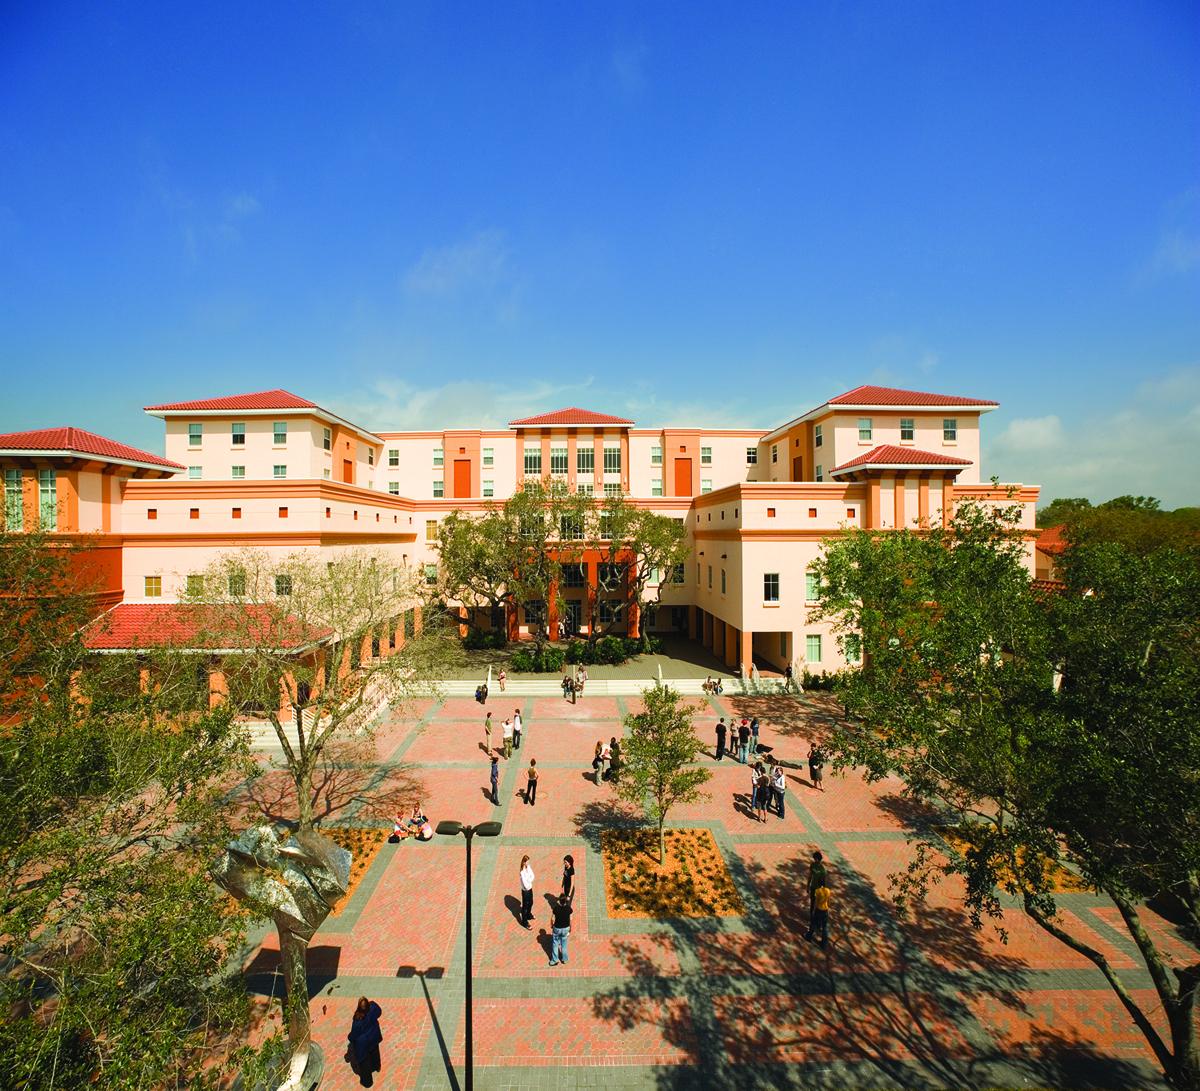 ringling college campus florida sarasota arts basch matusiak daniel richard barbara 1931 center highlights visual illustration jeff prweb